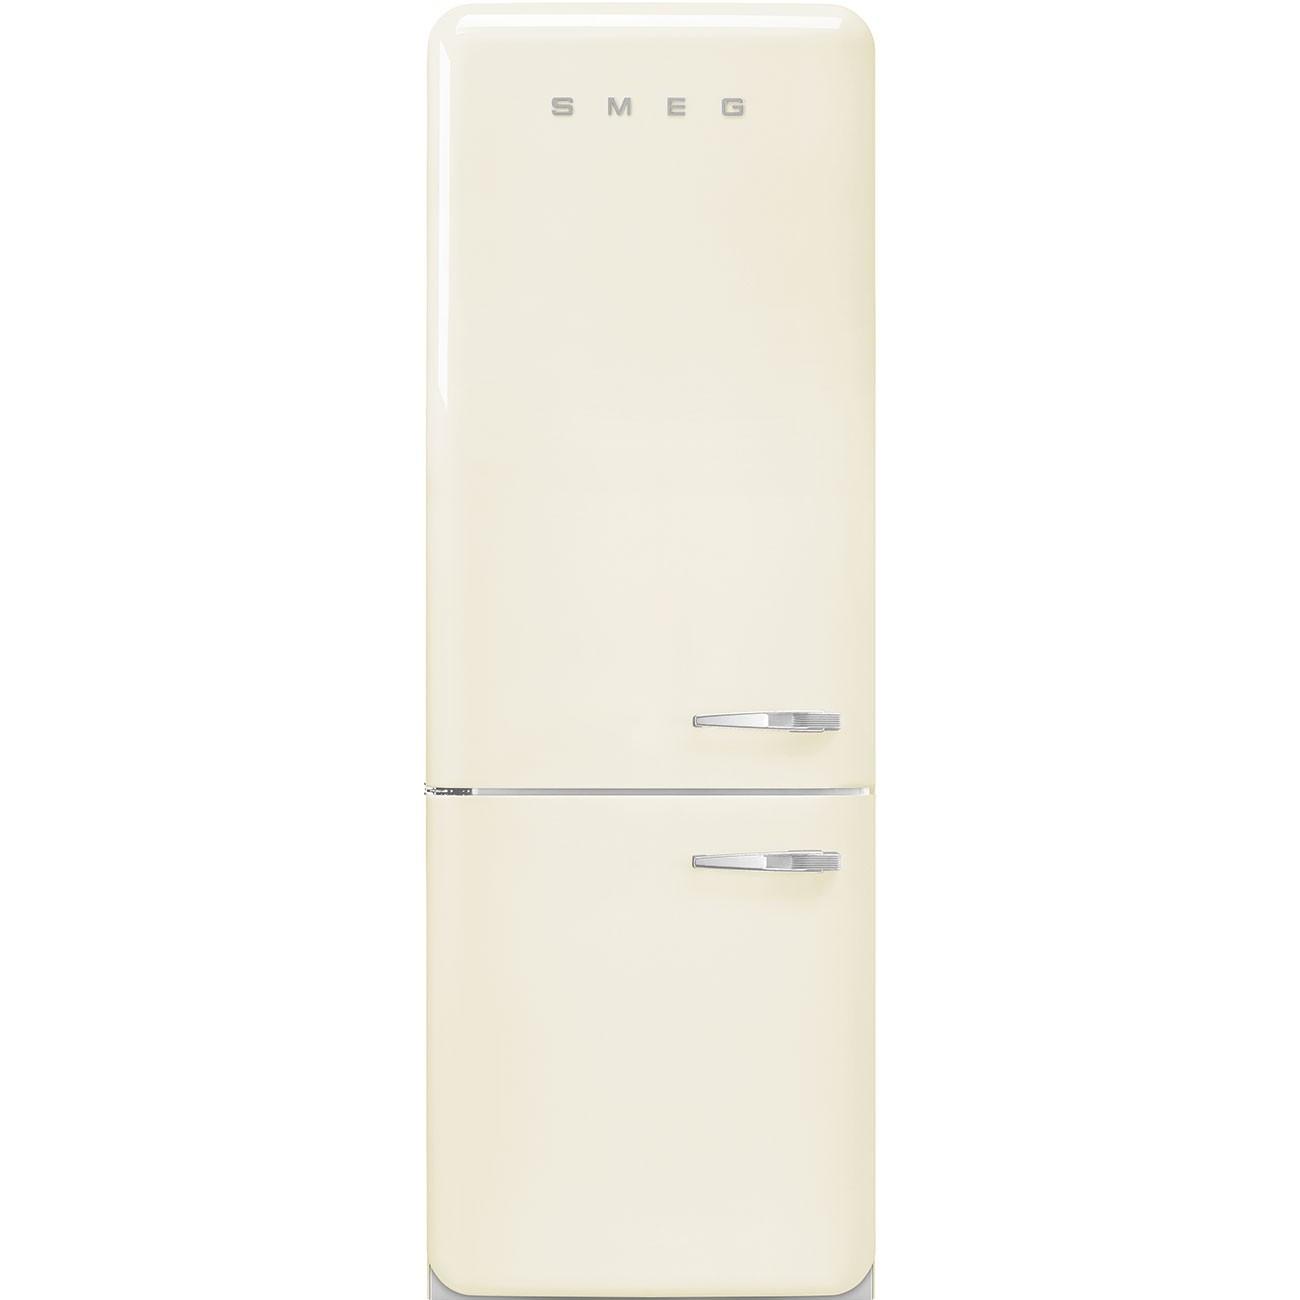 Anni 50 Frigorifero Smeg smeg fab38lcr - frigorifero combinato smeg anni '50, panna ,larghezza 70 cm  , 461 litri, cerniere a sinistra , a++ , total no frost